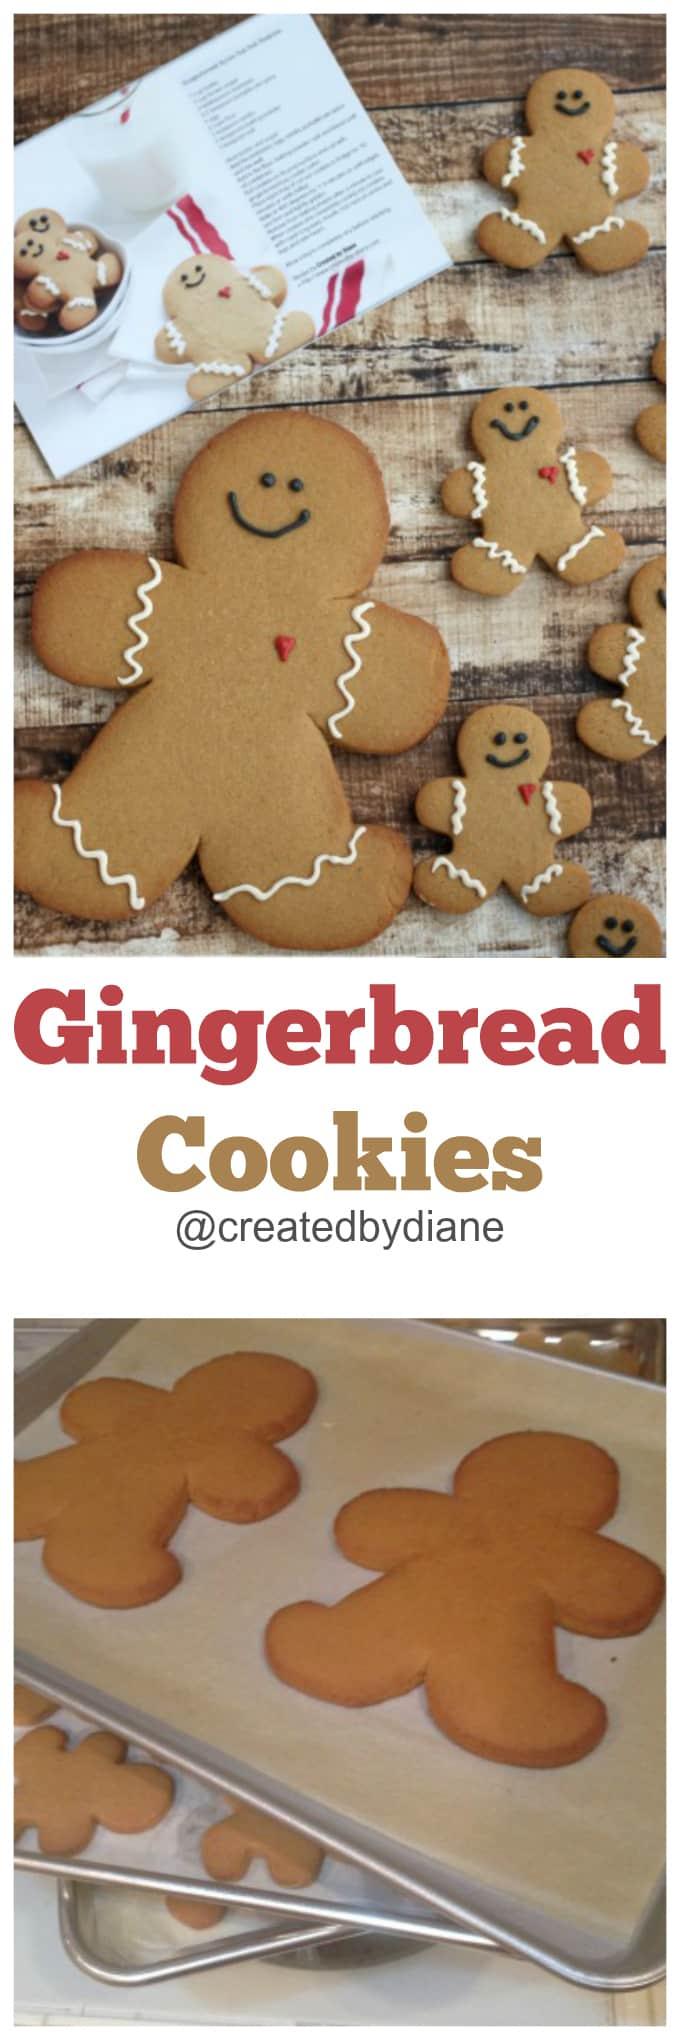 gingerbread cookies from @createdbydiane